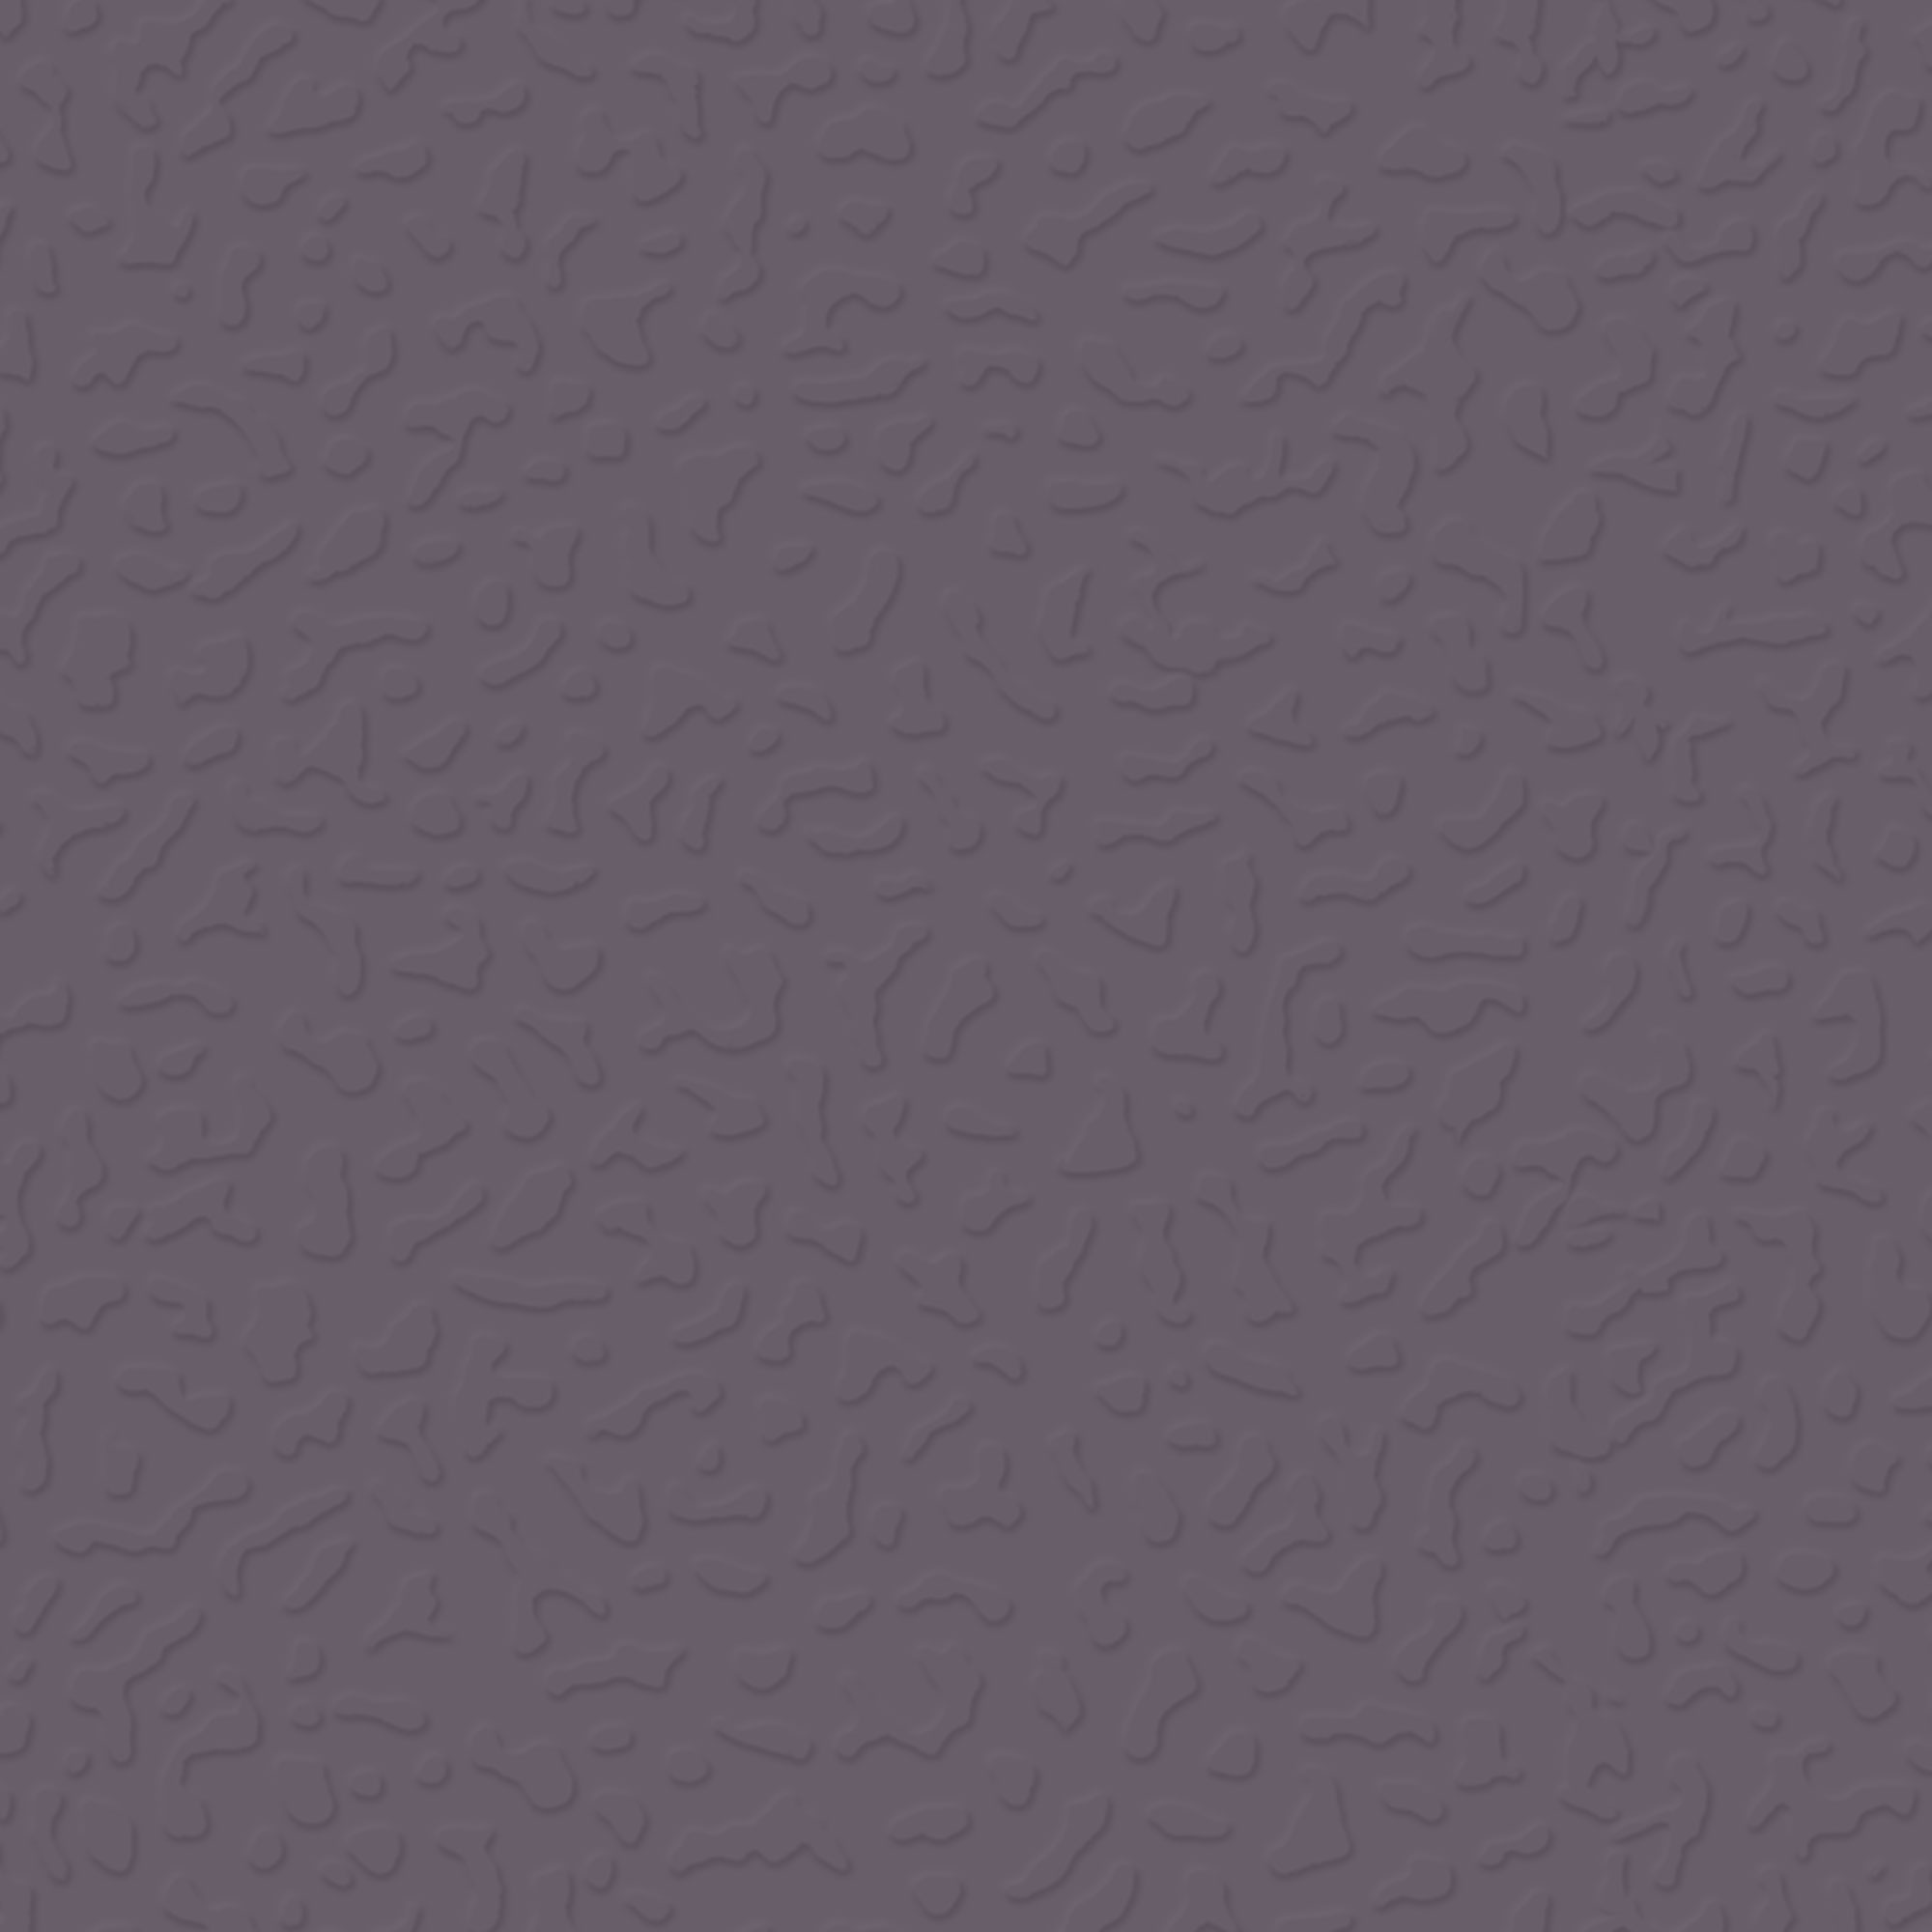 Roppe Rubber Tile 900 - Textured Design (993) Merlin Rubber Flooring